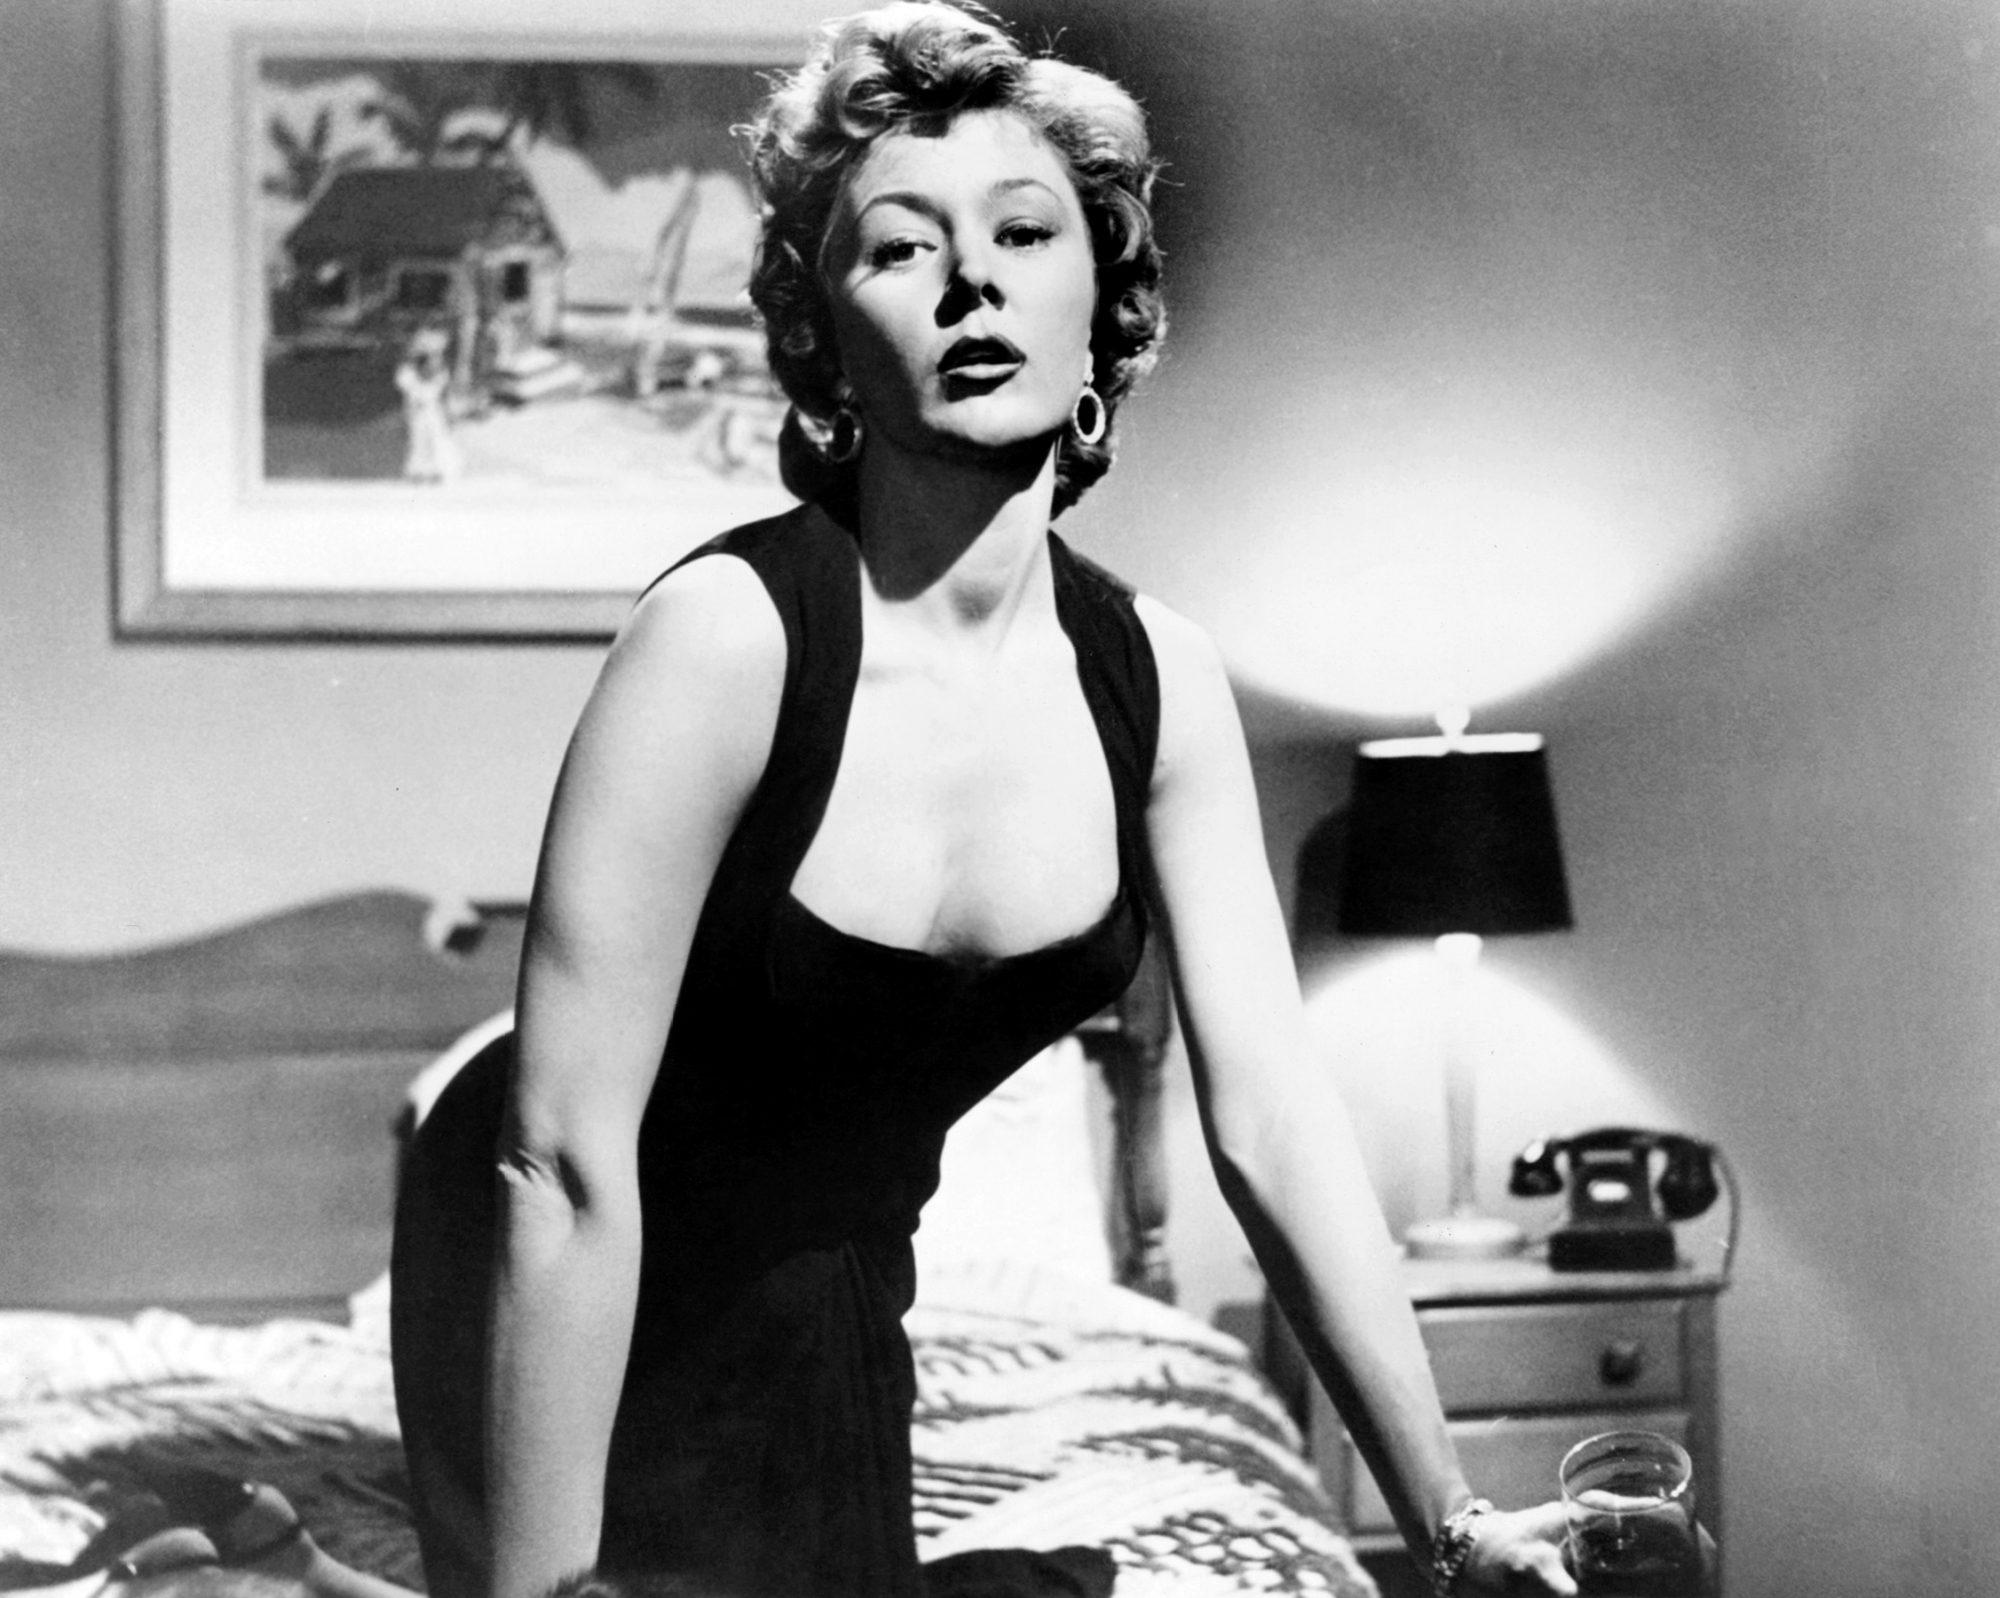 THE BIG HEAT, Gloria Grahame, 1953